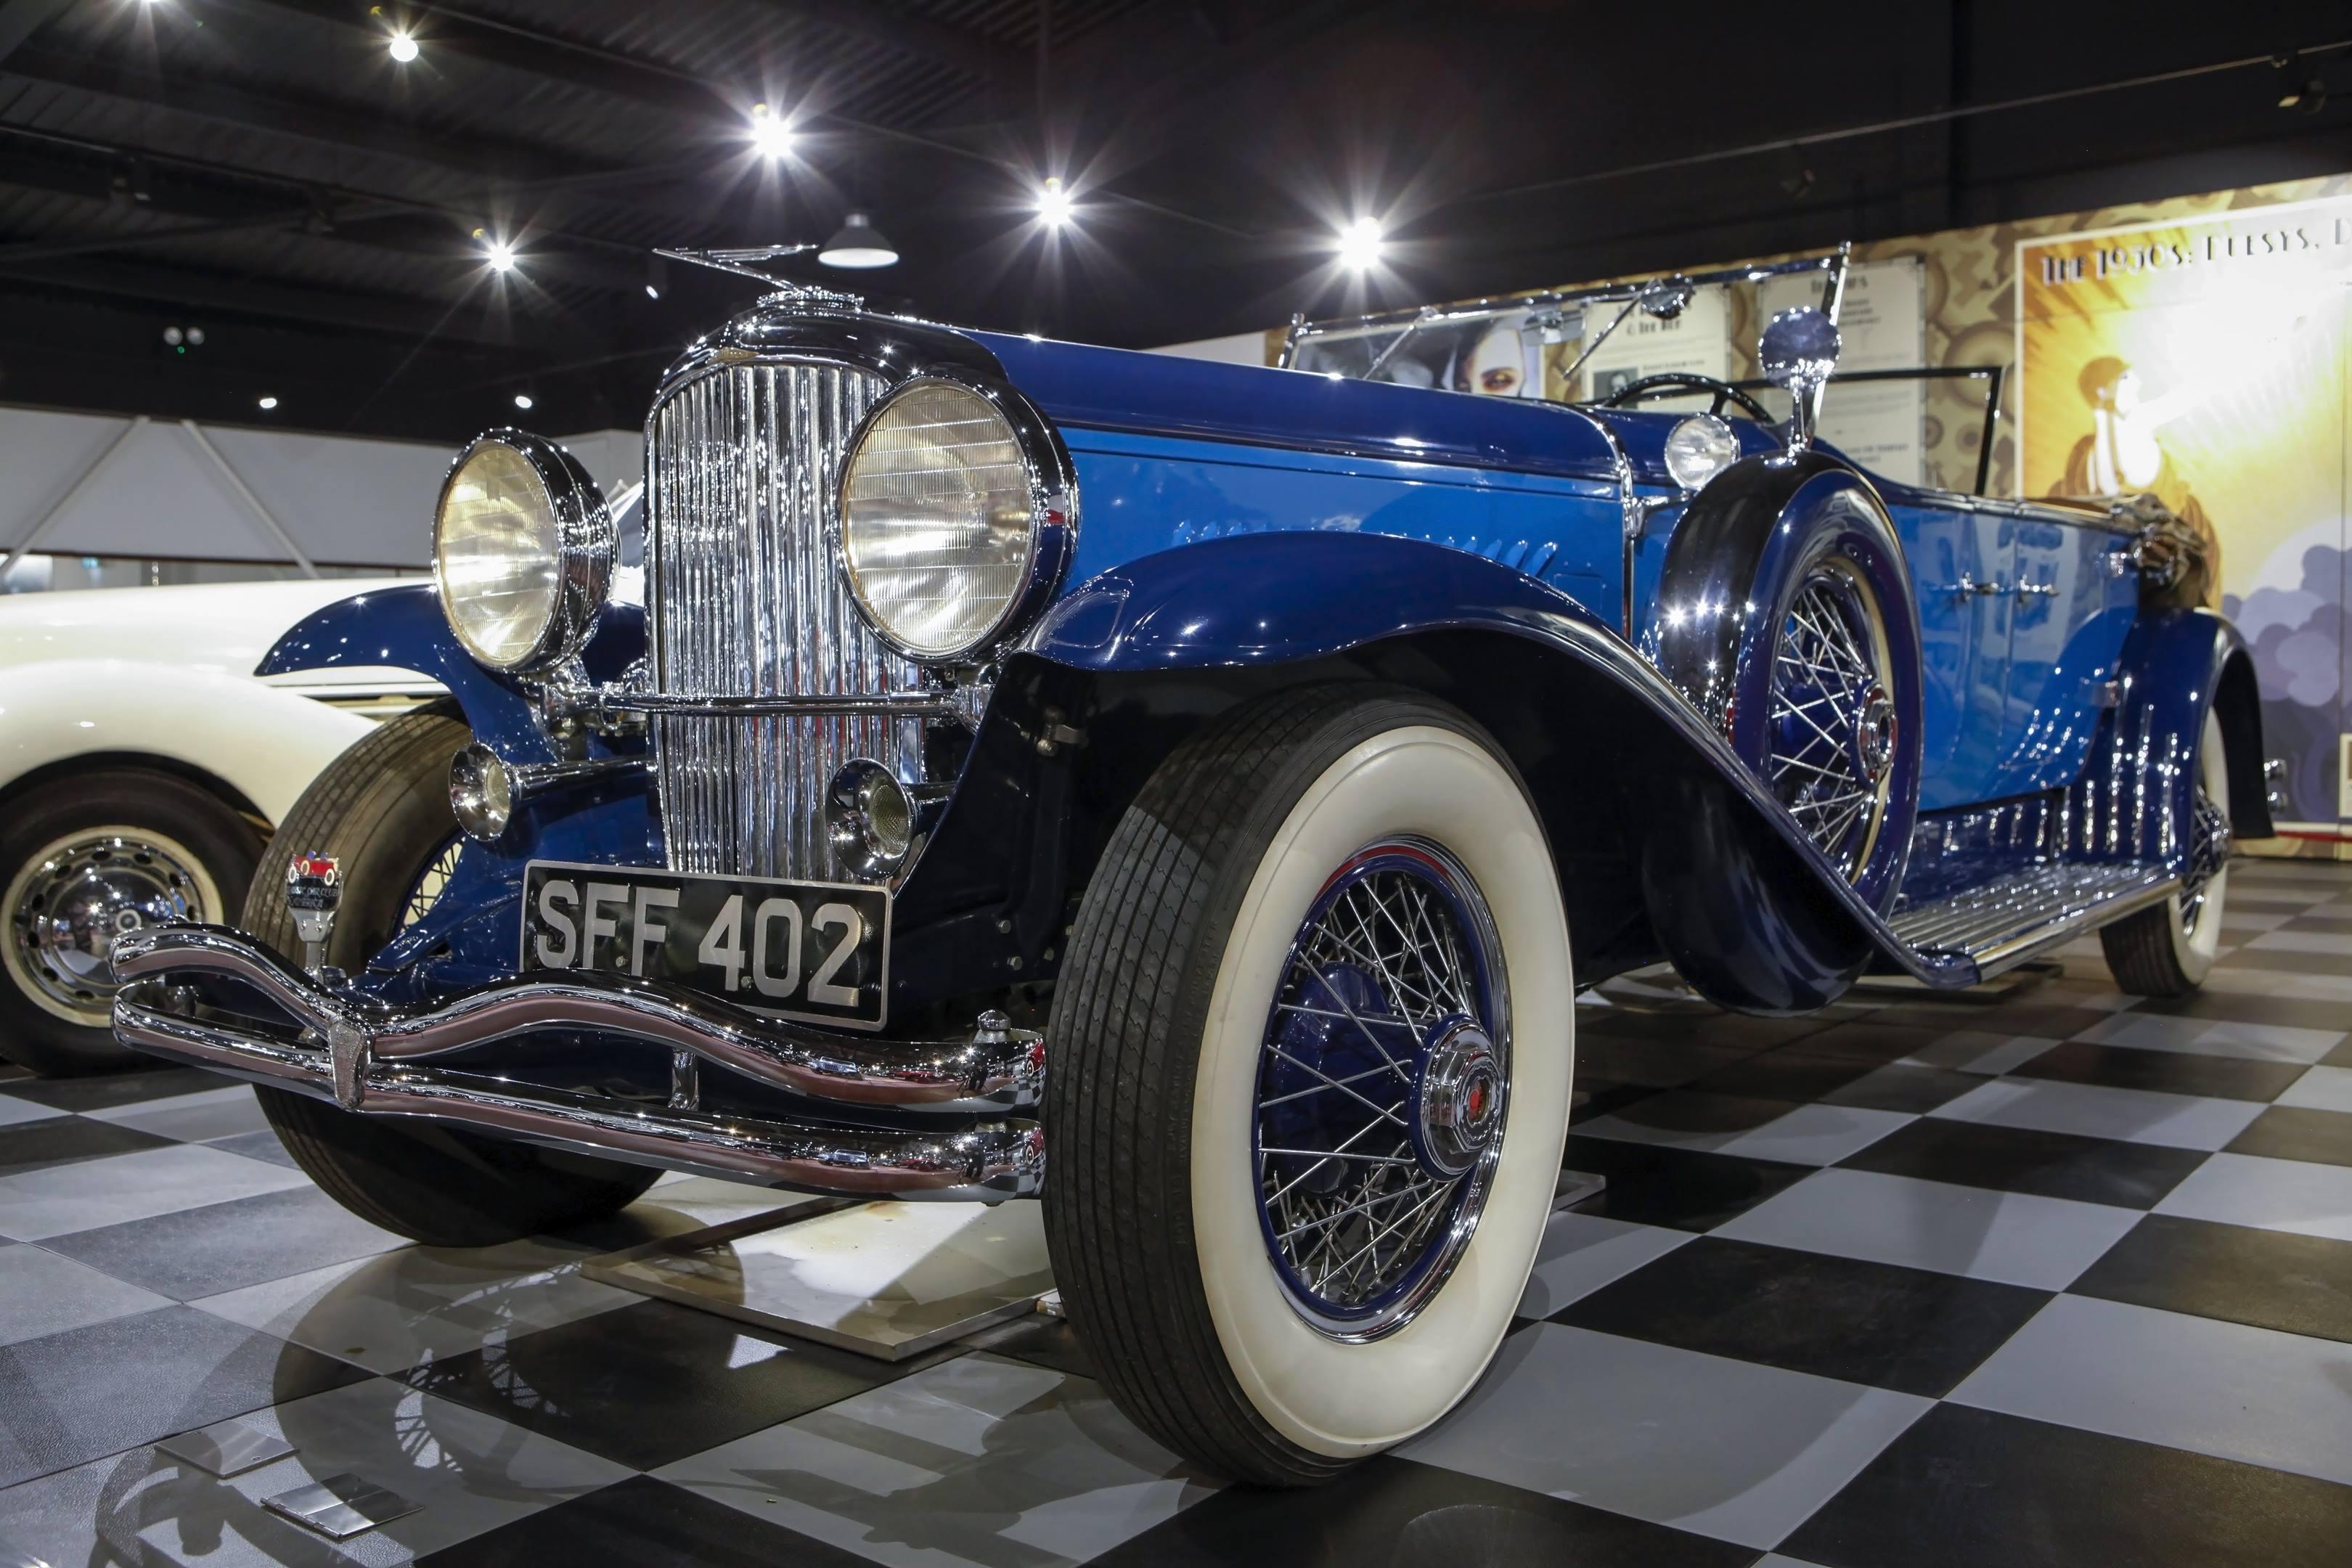 1931 duesenberg model j at the Haynes International Motor Museum